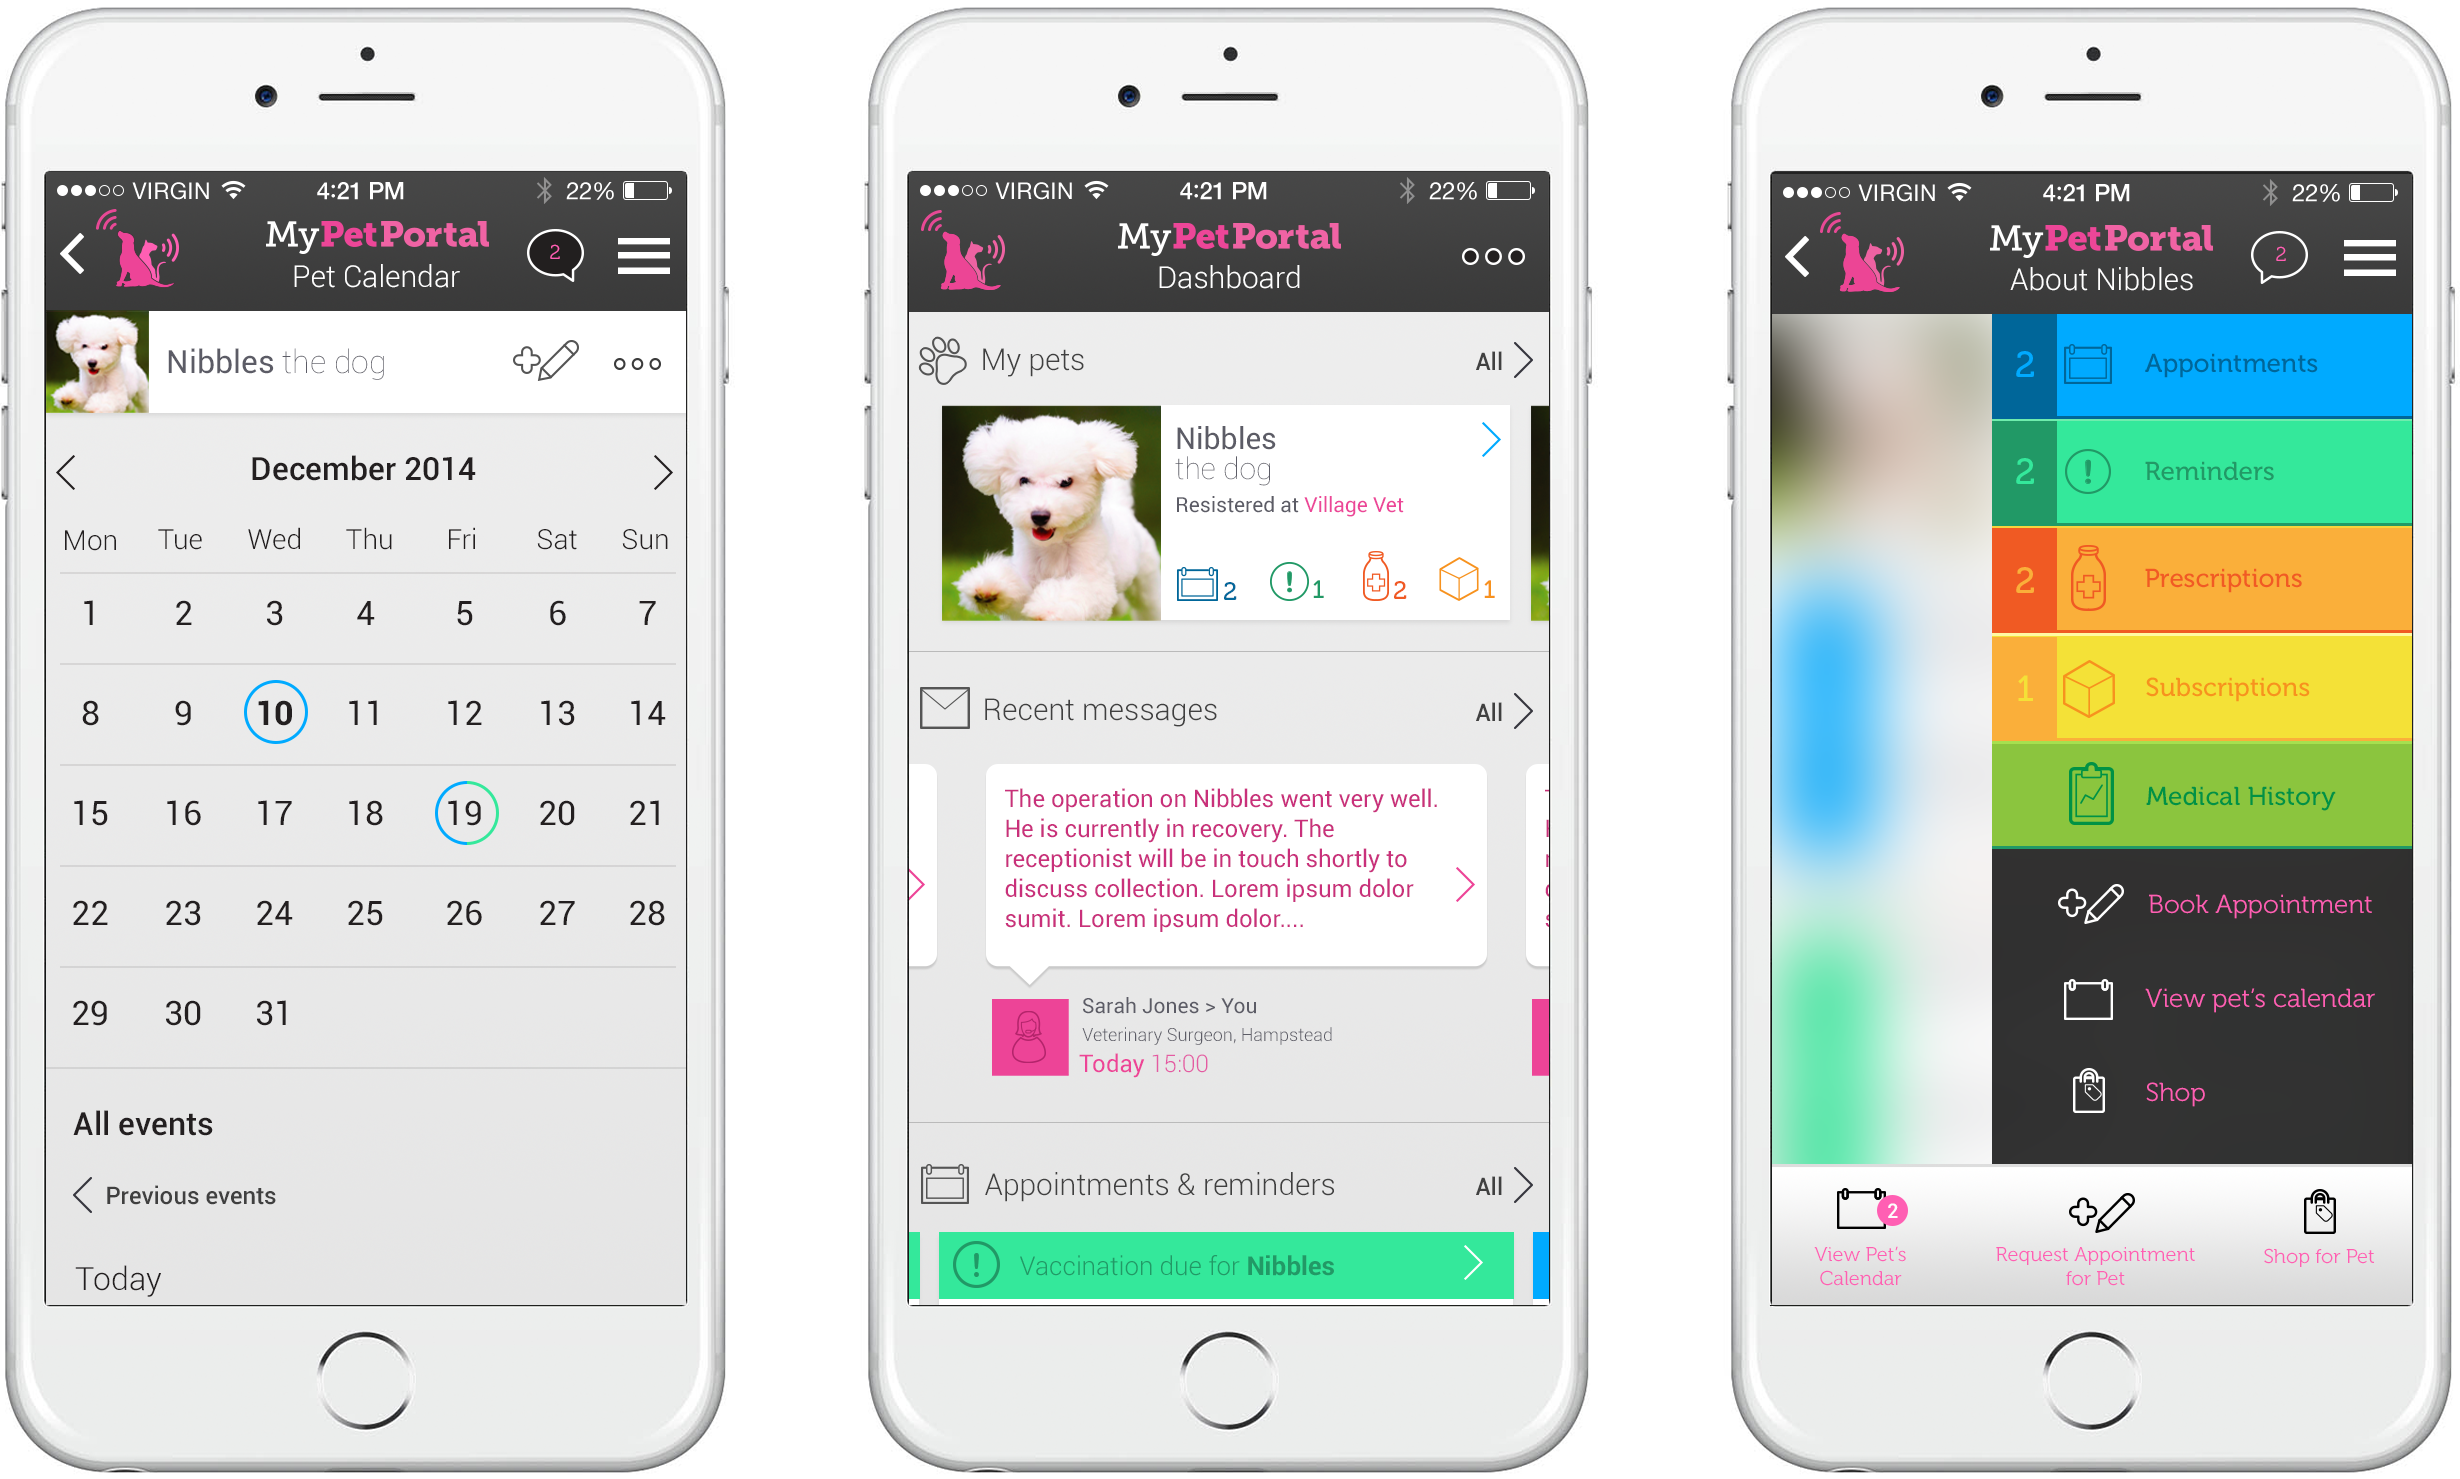 MyPetPortal app design